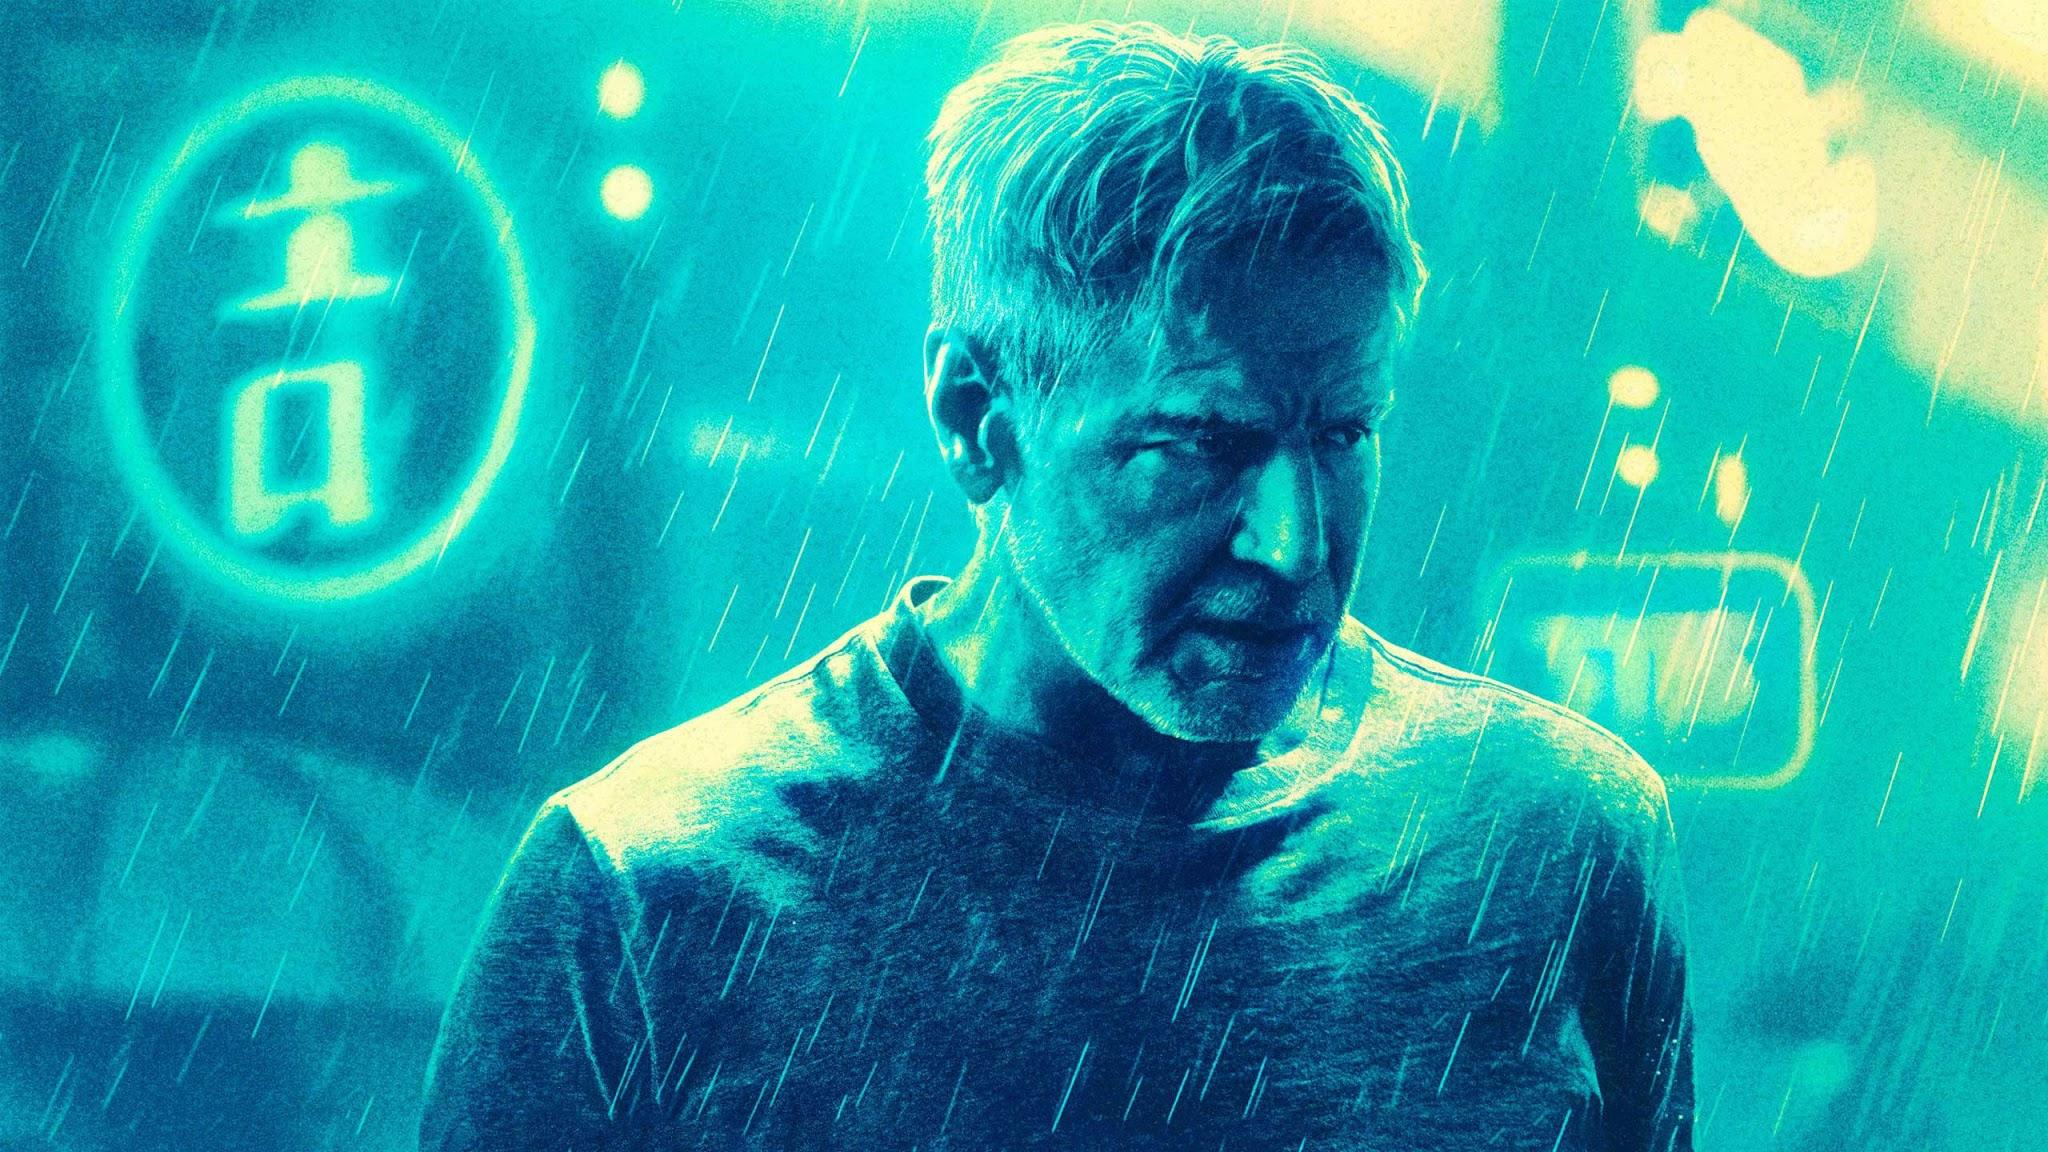 Harrison Ford Blade Runner 2049 Hd